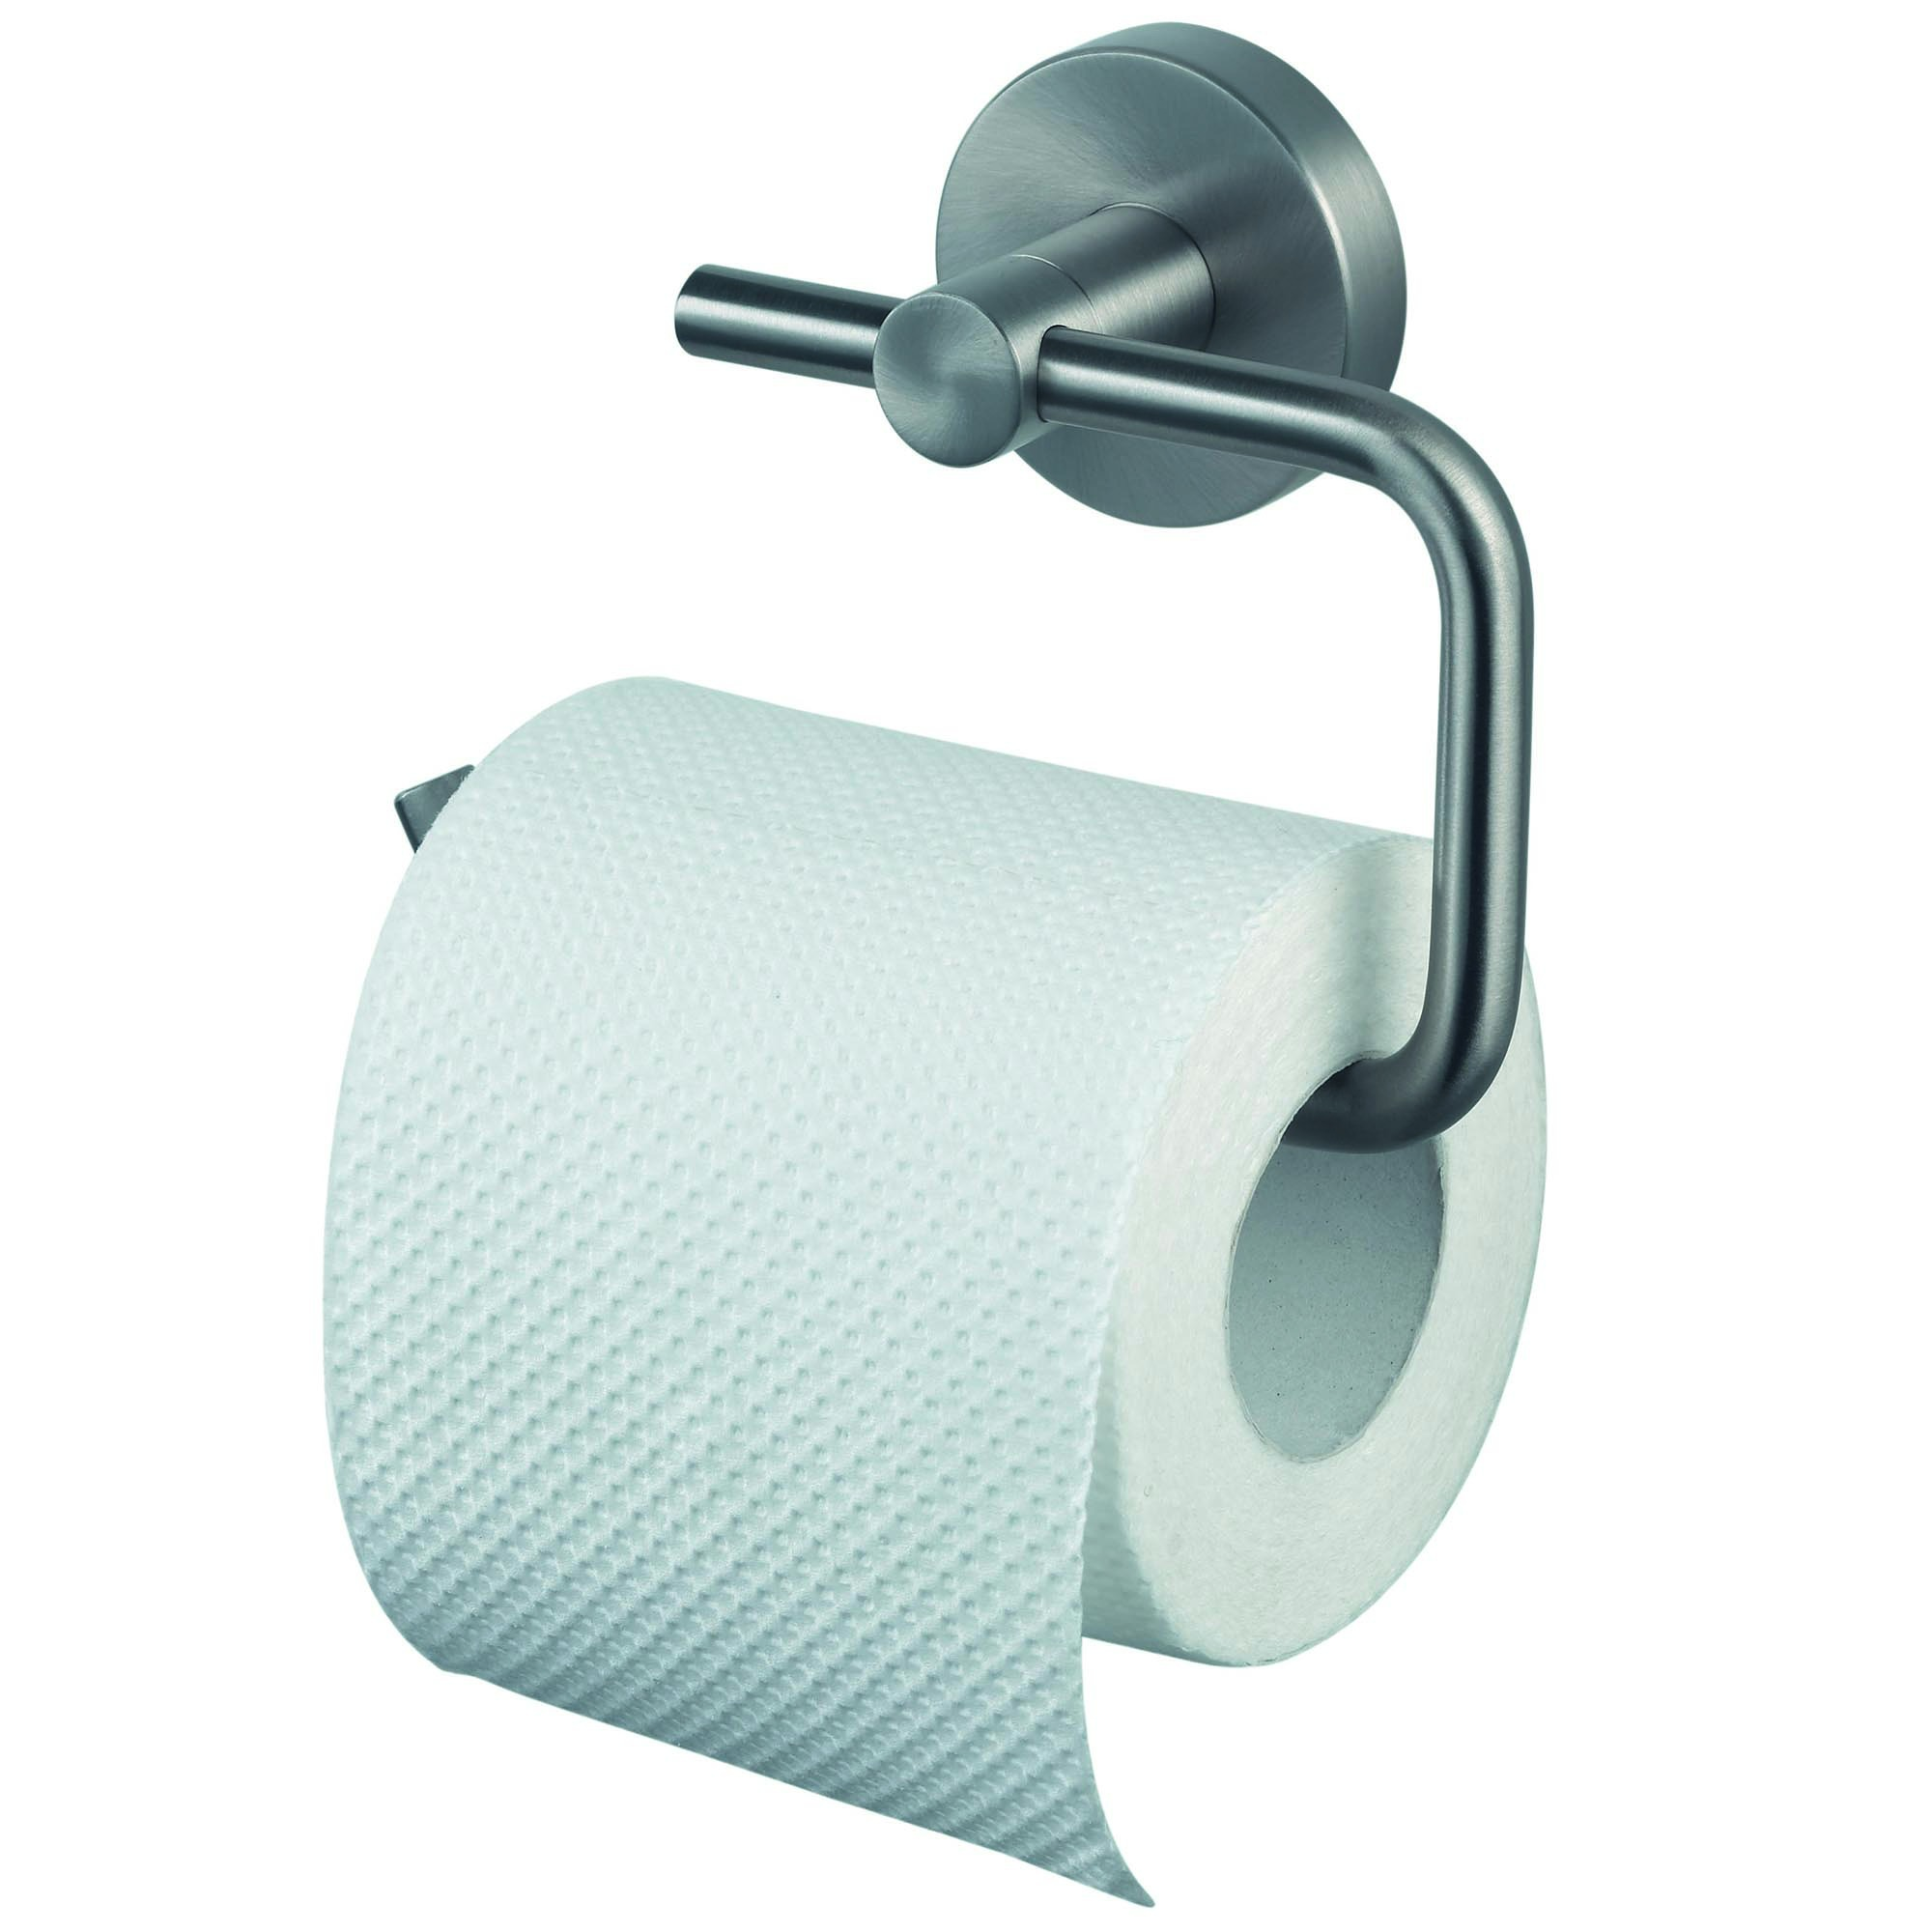 Haceka Kosmos wcrolhouder inox  Toiletaccessoires  Toiletten  Sanitair, v # Jysk Wc Rolhouder_081306